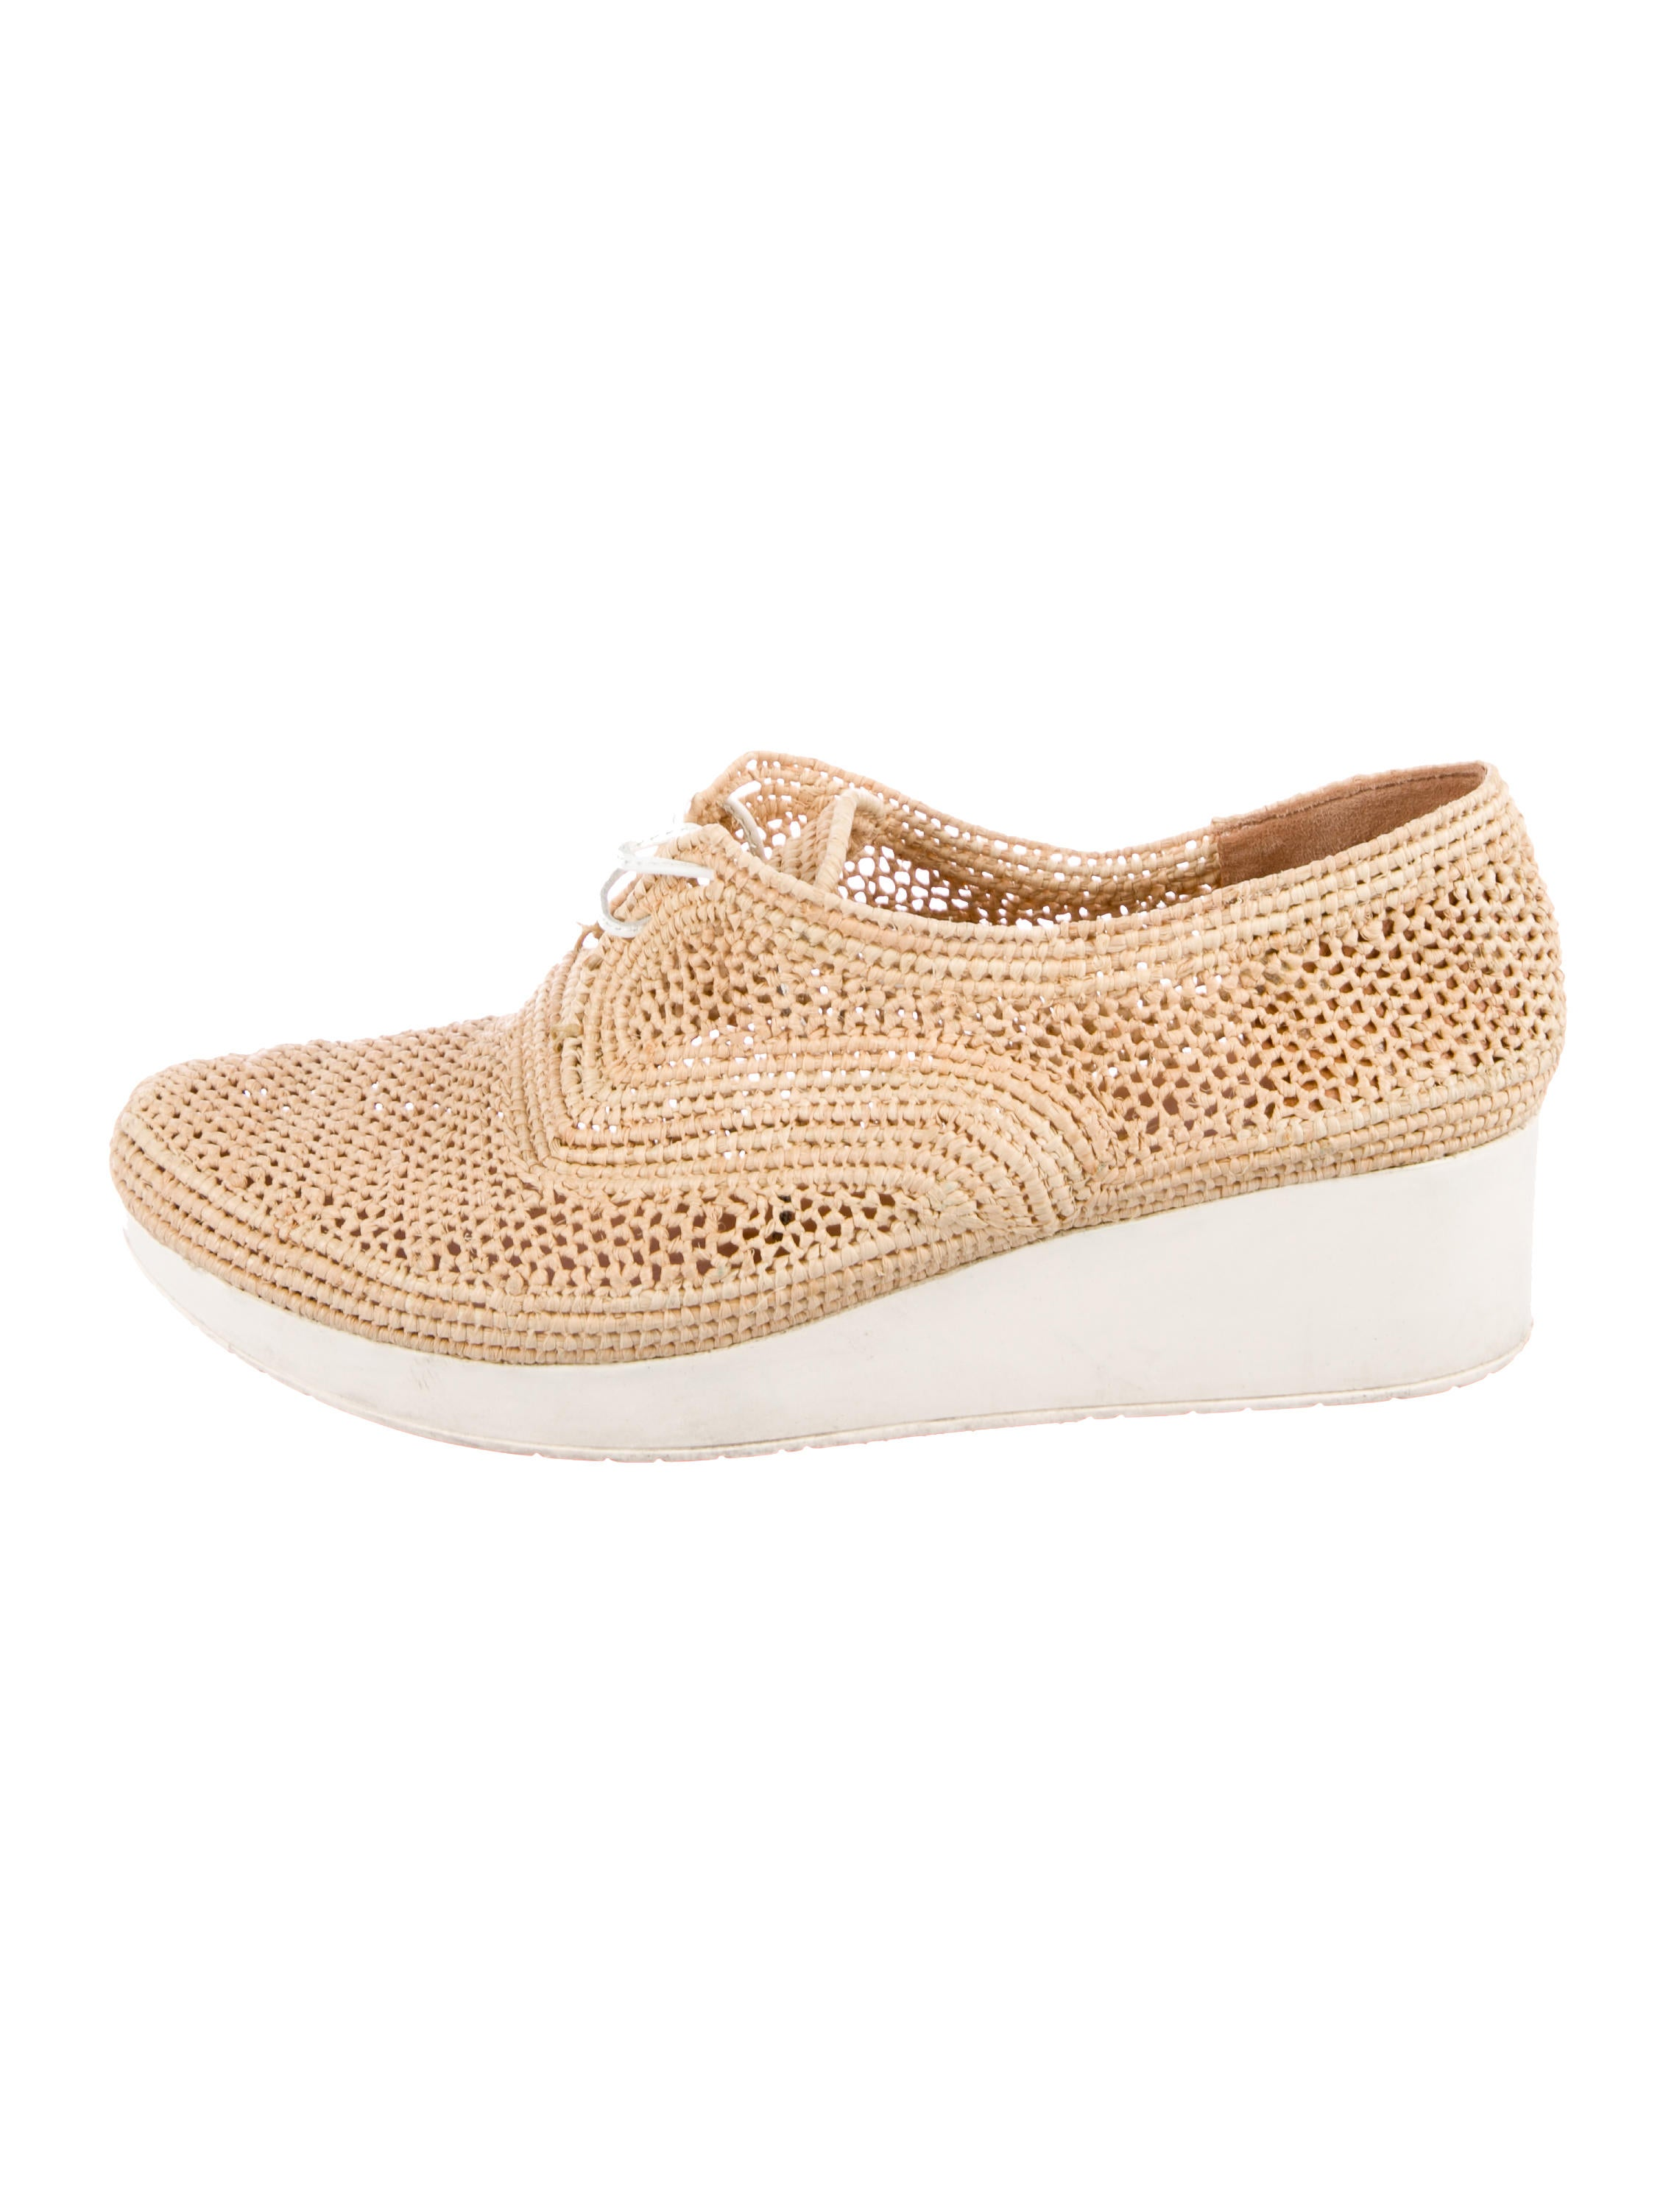 clearance 2014 unisex Robert Clergerie Vicolek Raffia Sneakers official cheap online sale latest 4Y2r6YNC